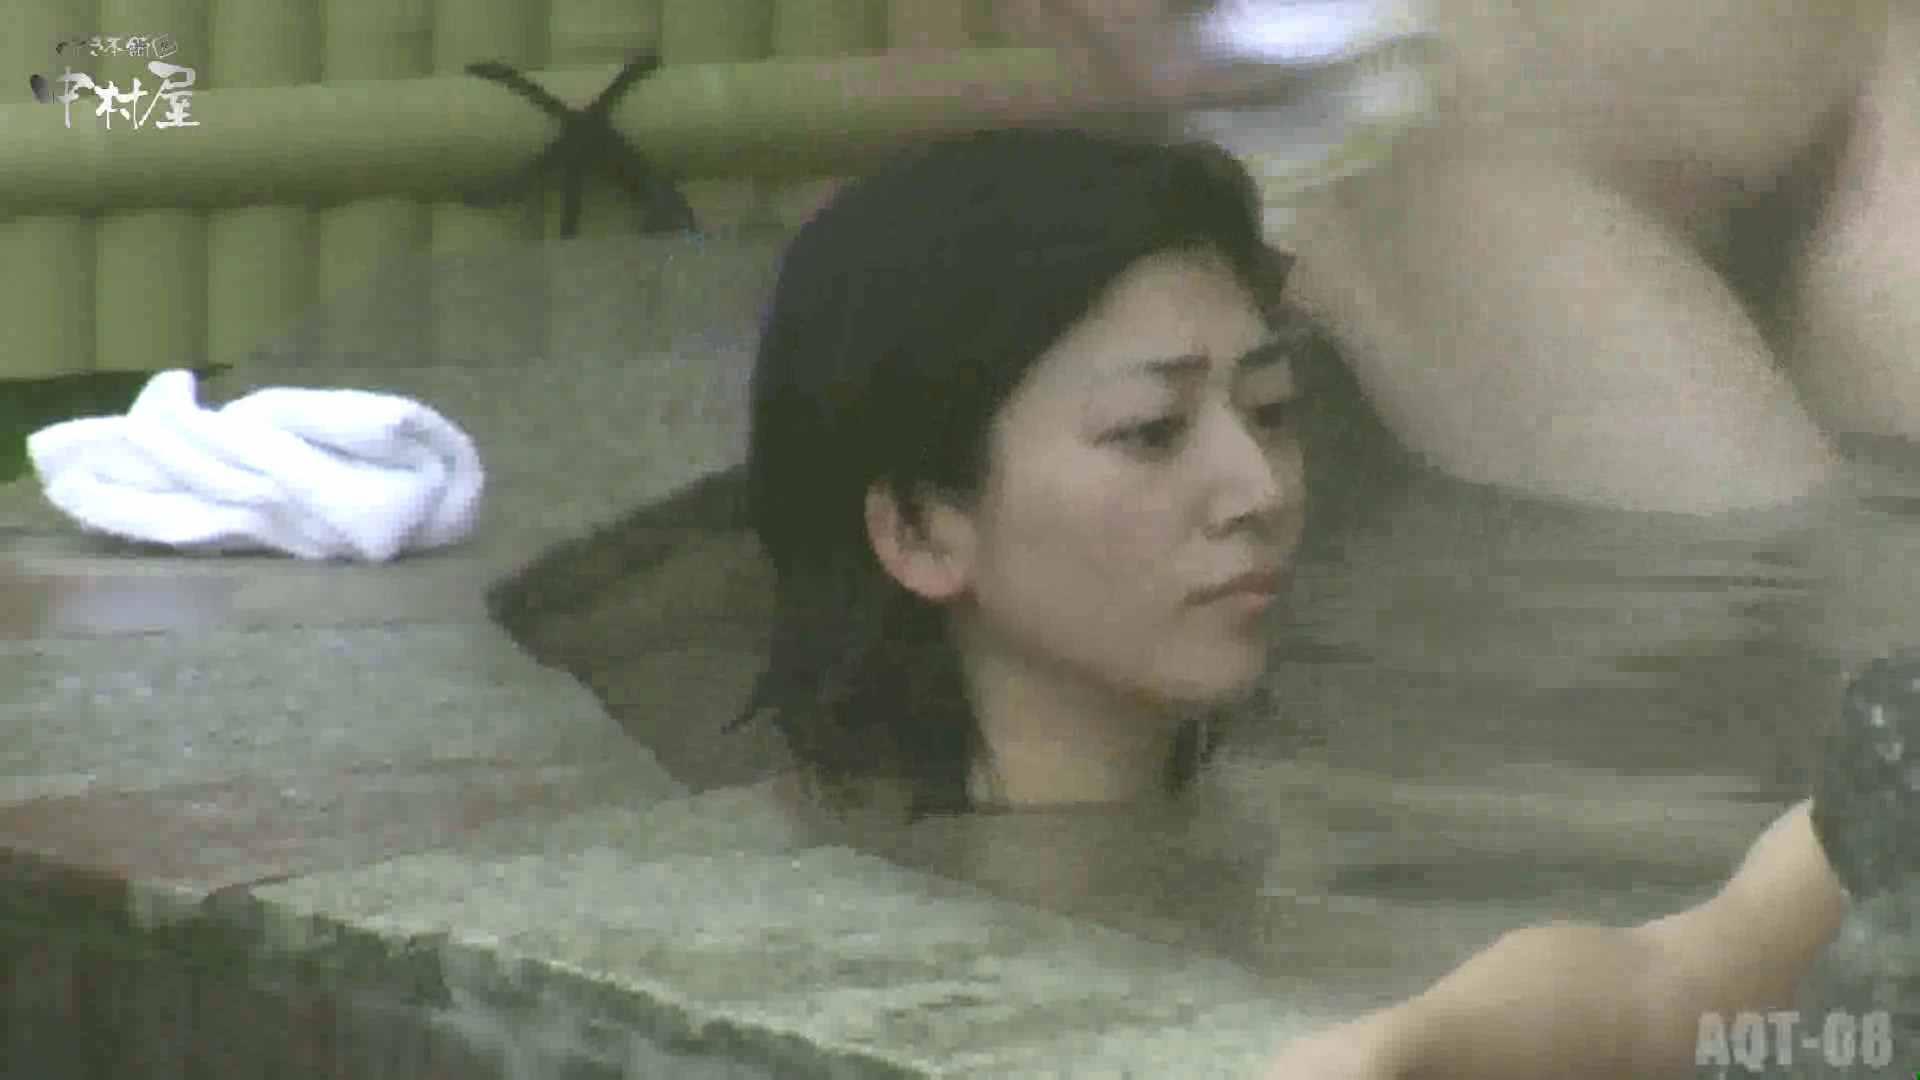 Aquaな露天風呂Vol.872潜入盗撮露天風呂八判湯 其の四 OL女体 | 女体盗撮  92連発 37